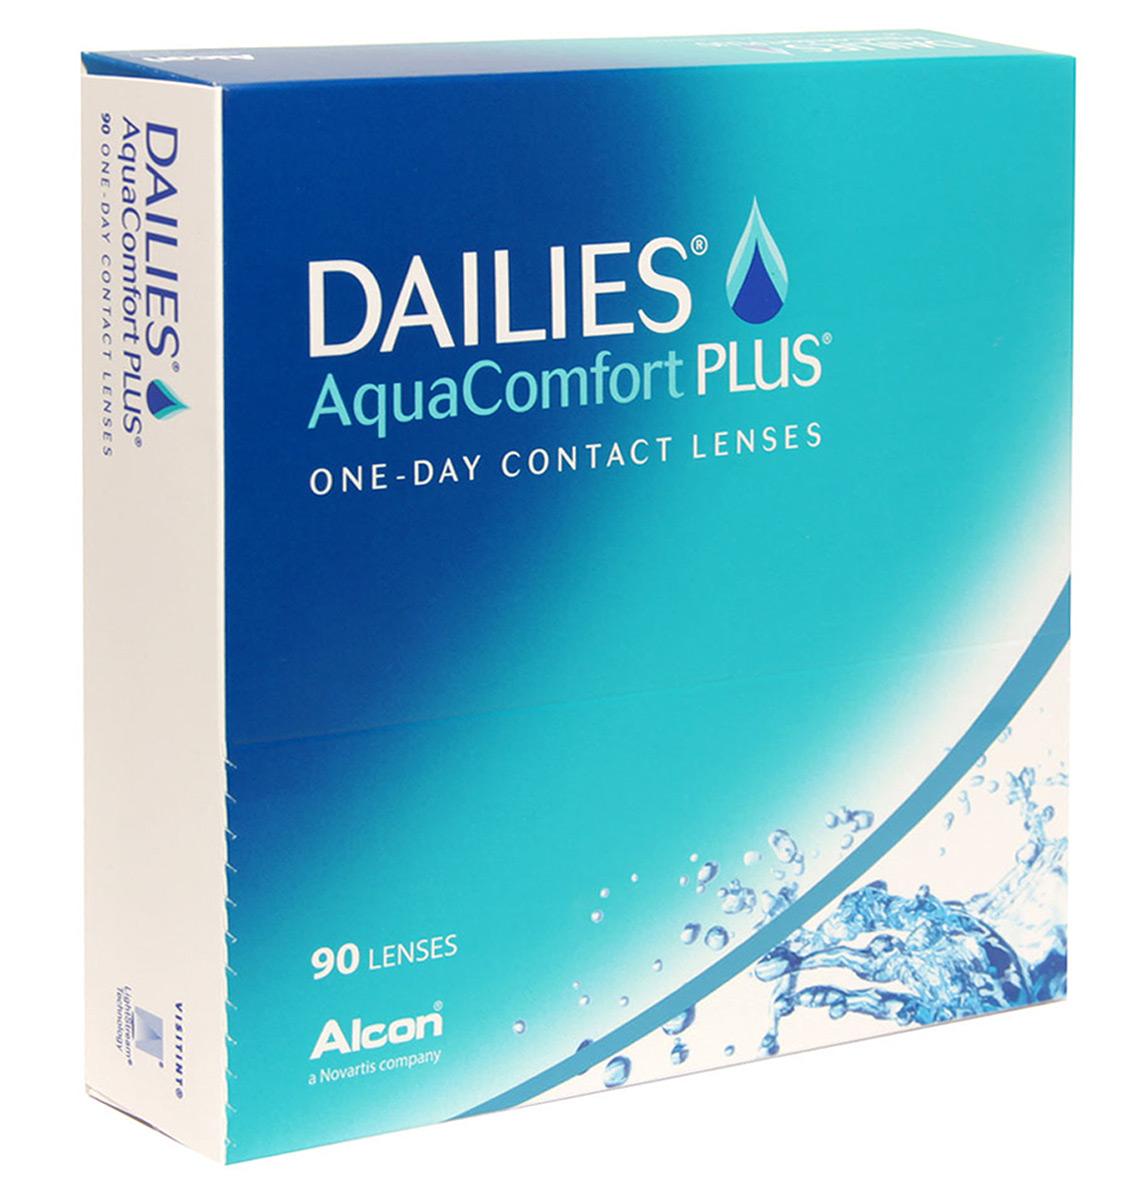 Alcon-CIBA Vision контактные линзы Dailies AquaComfort Plus (90шт / 8.7 / 14.0 / -2.50)